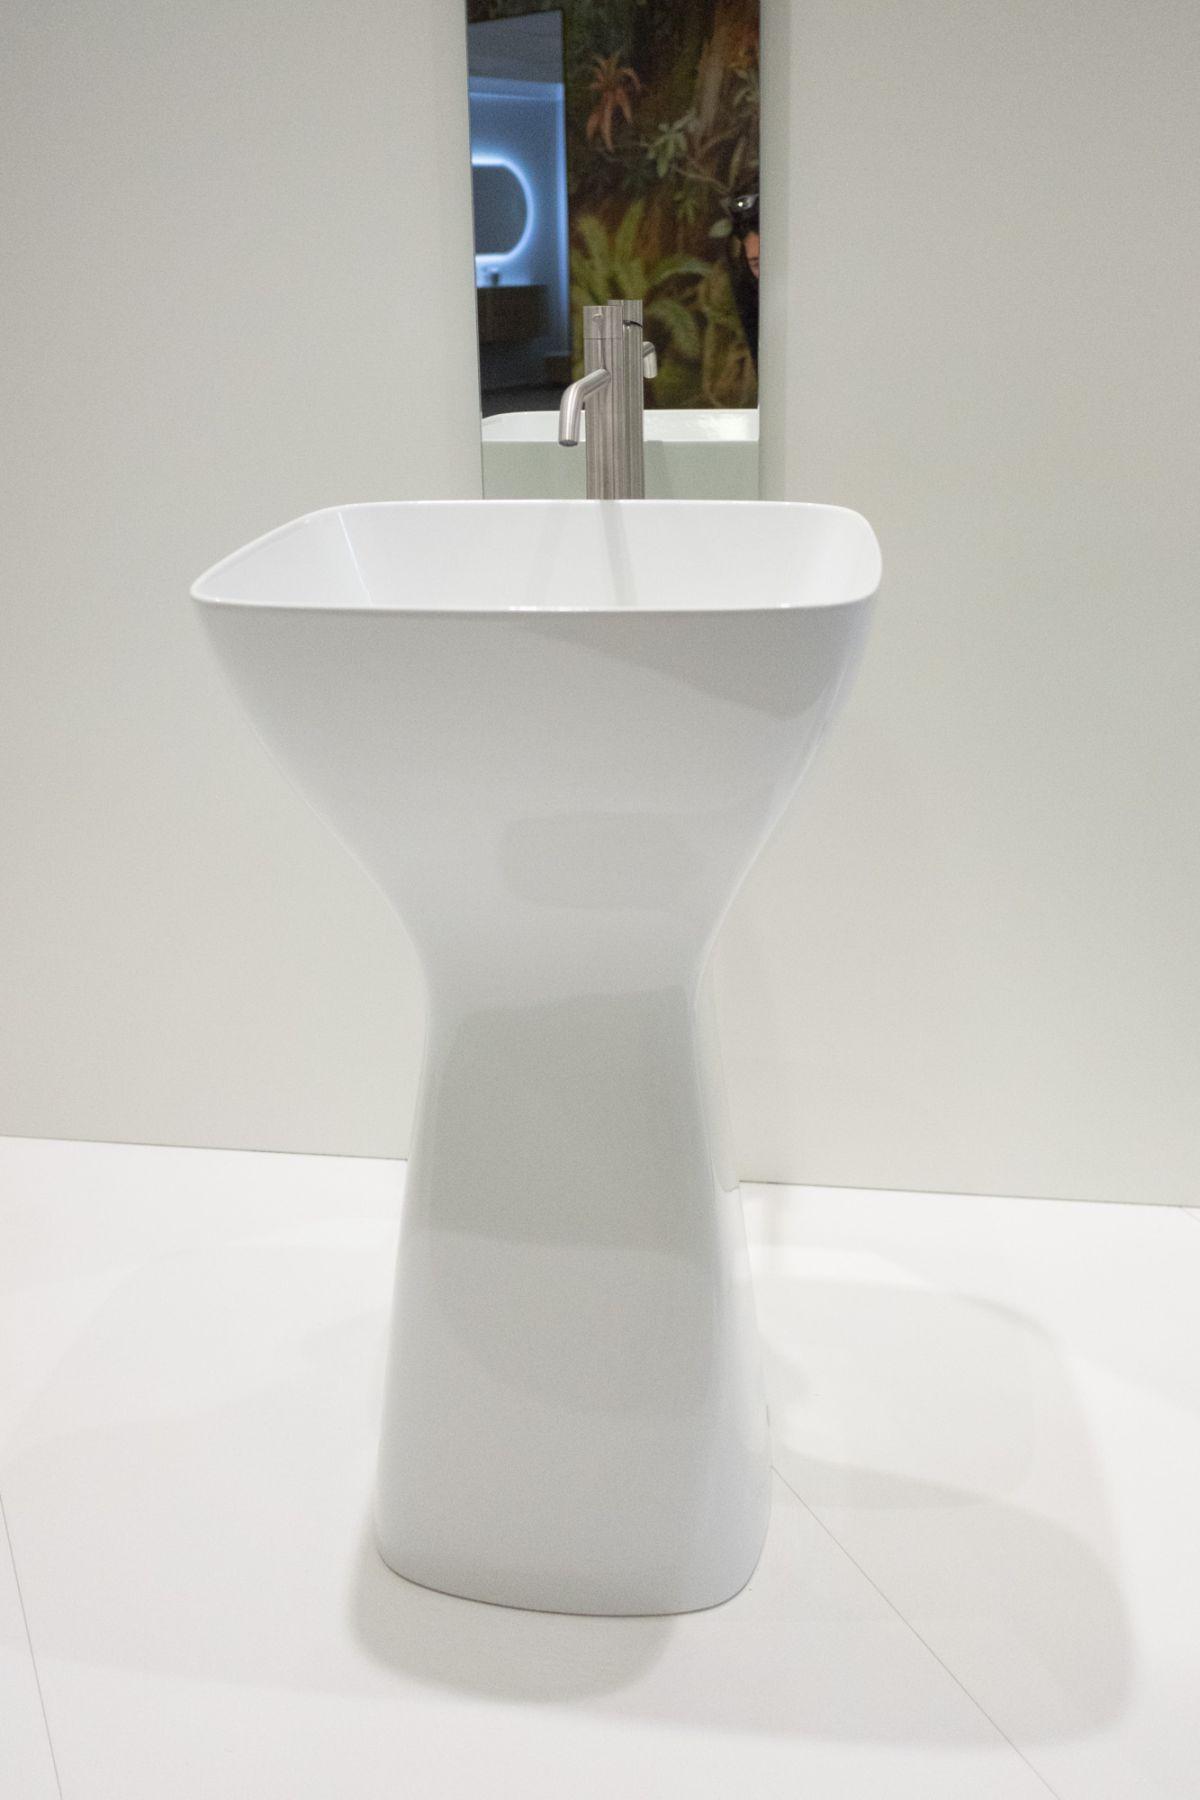 Eto ceramic pedestal sink